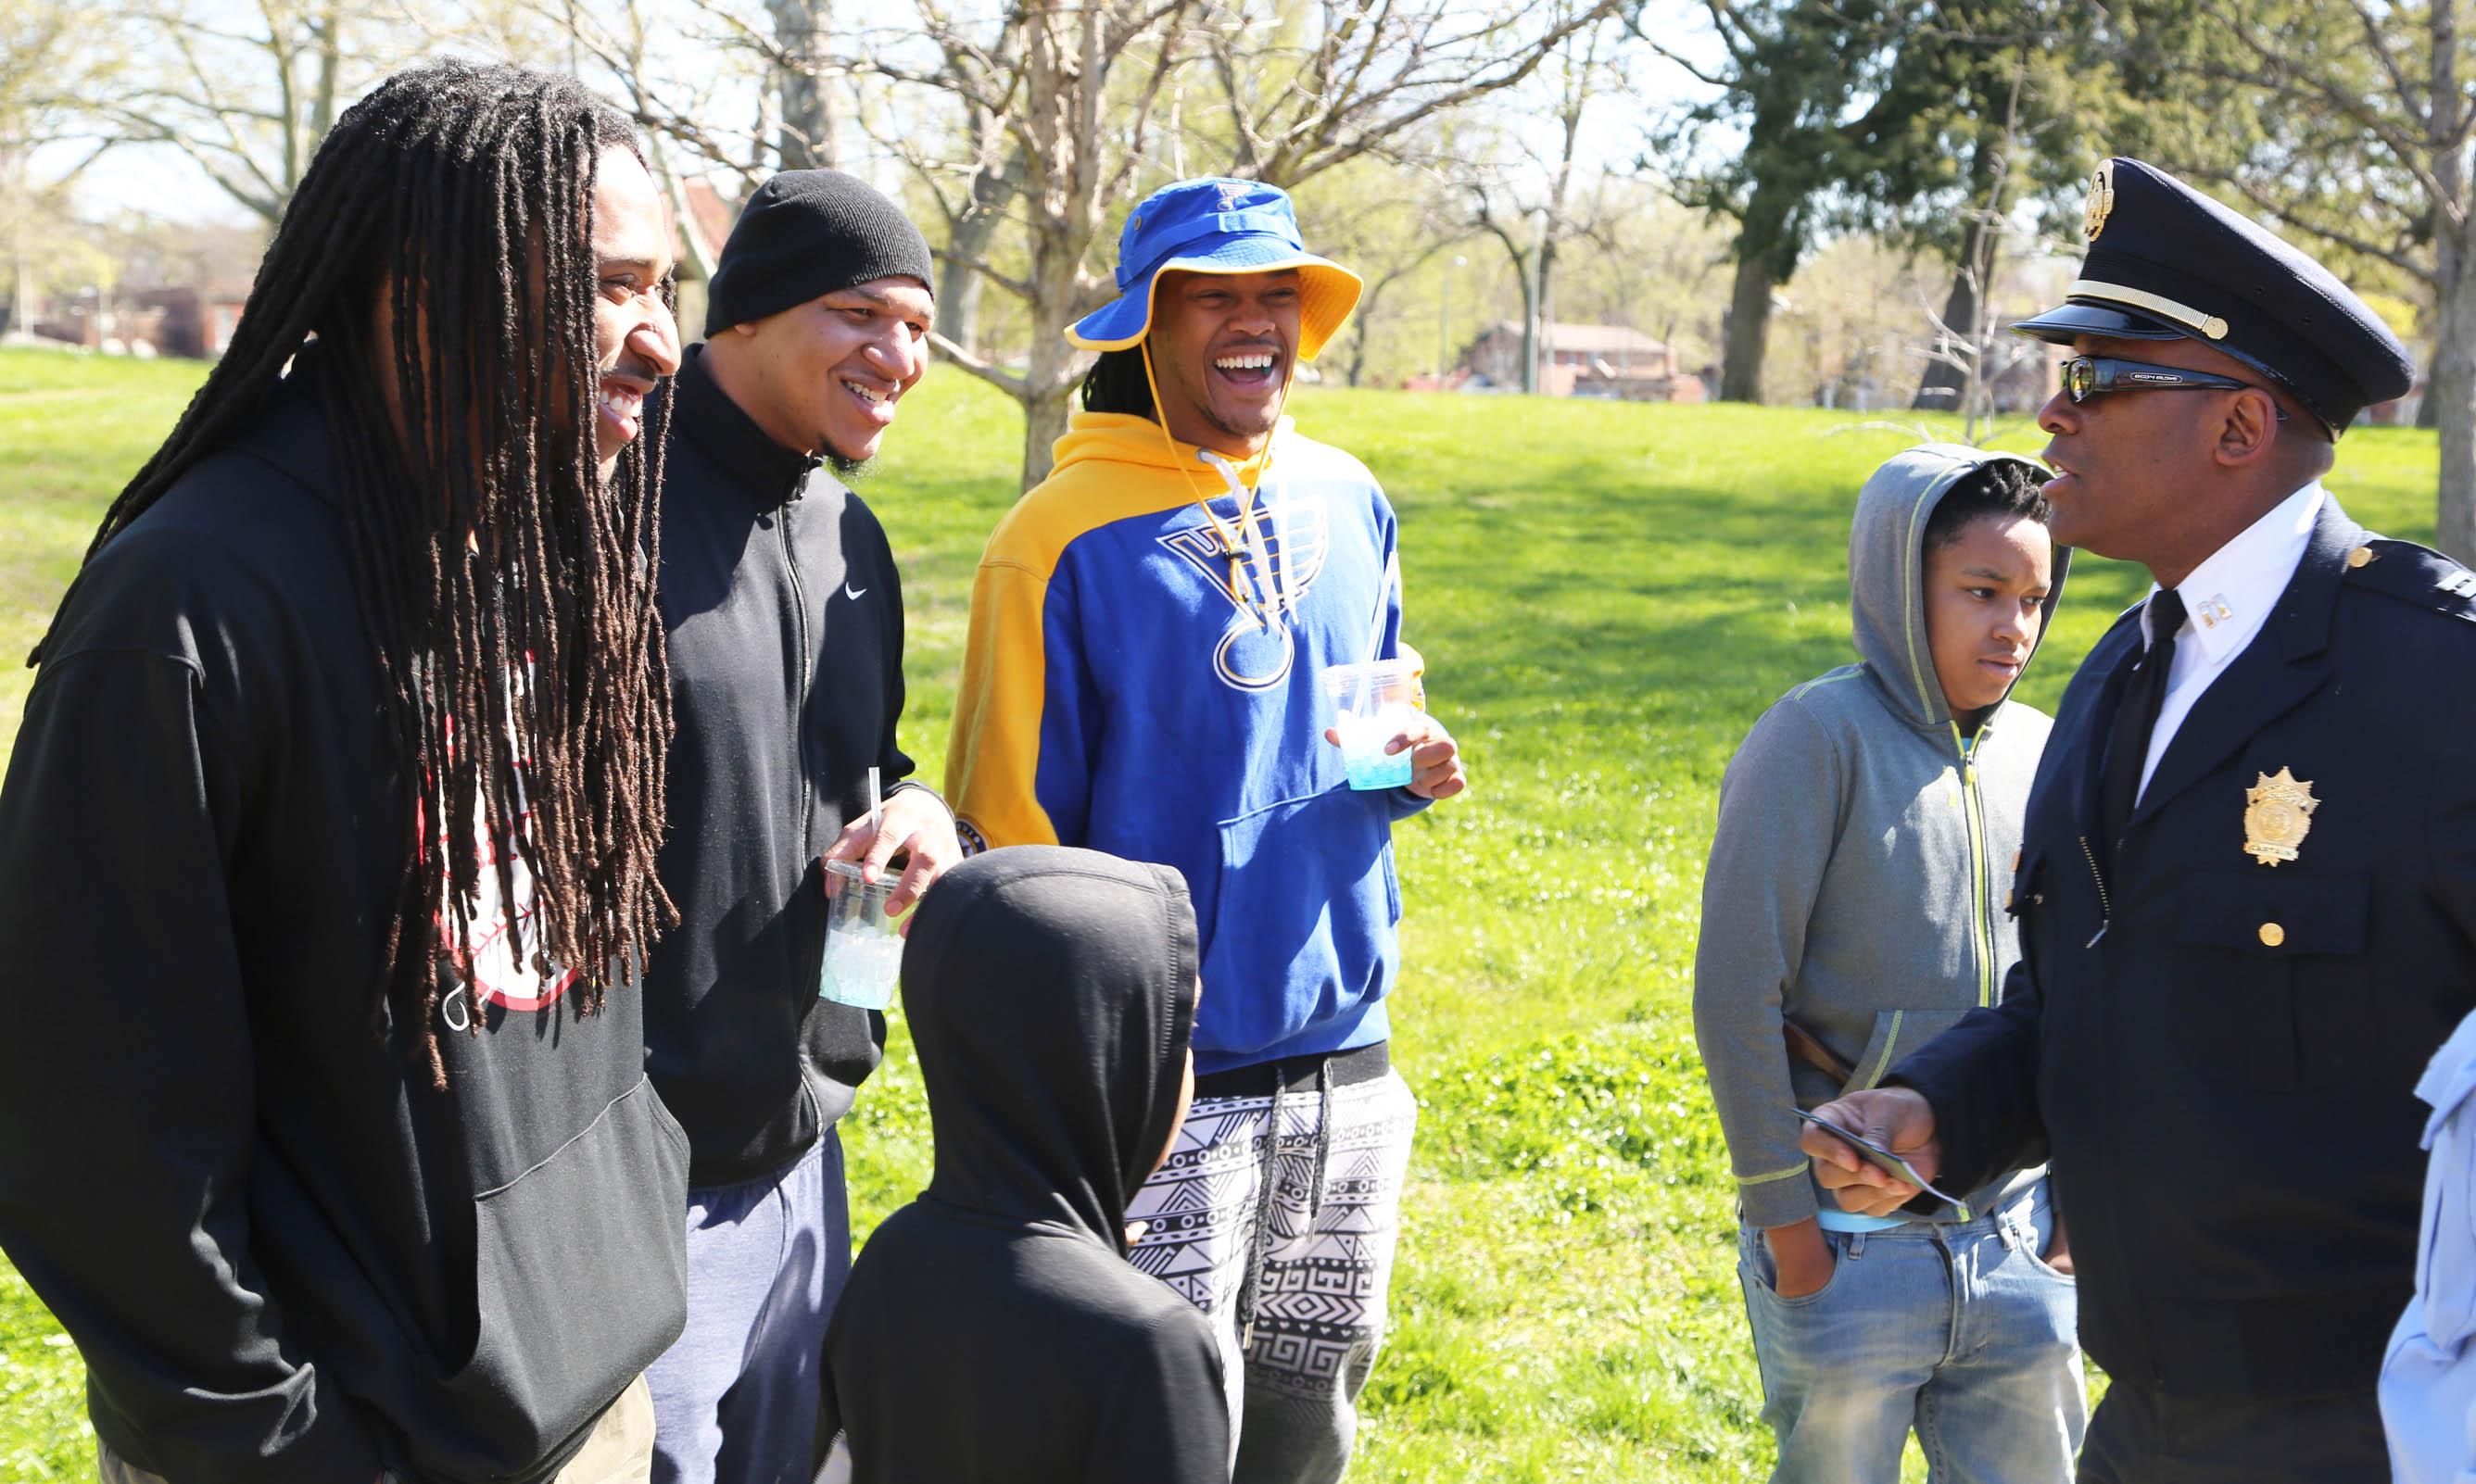 Crime in St. Louis: A Bright Spot